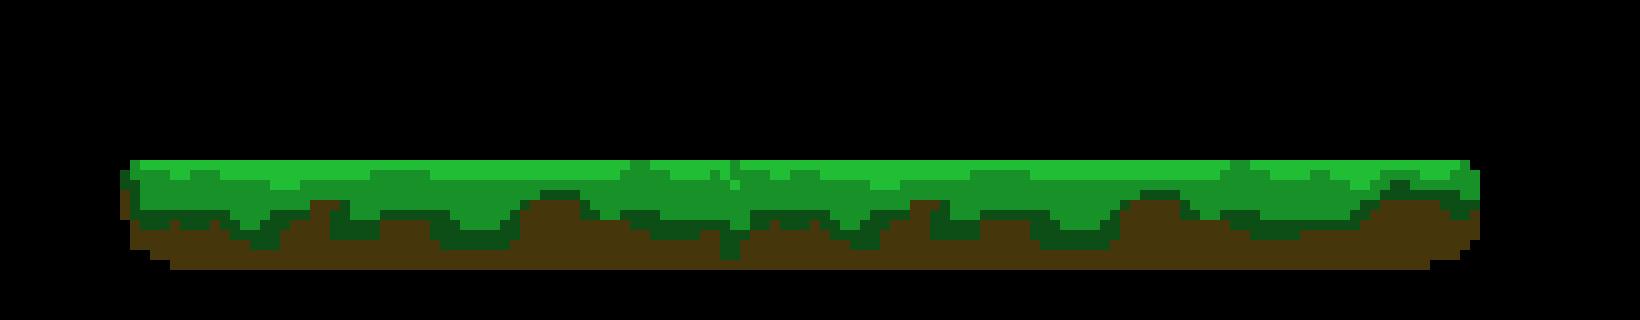 Pixel Platform